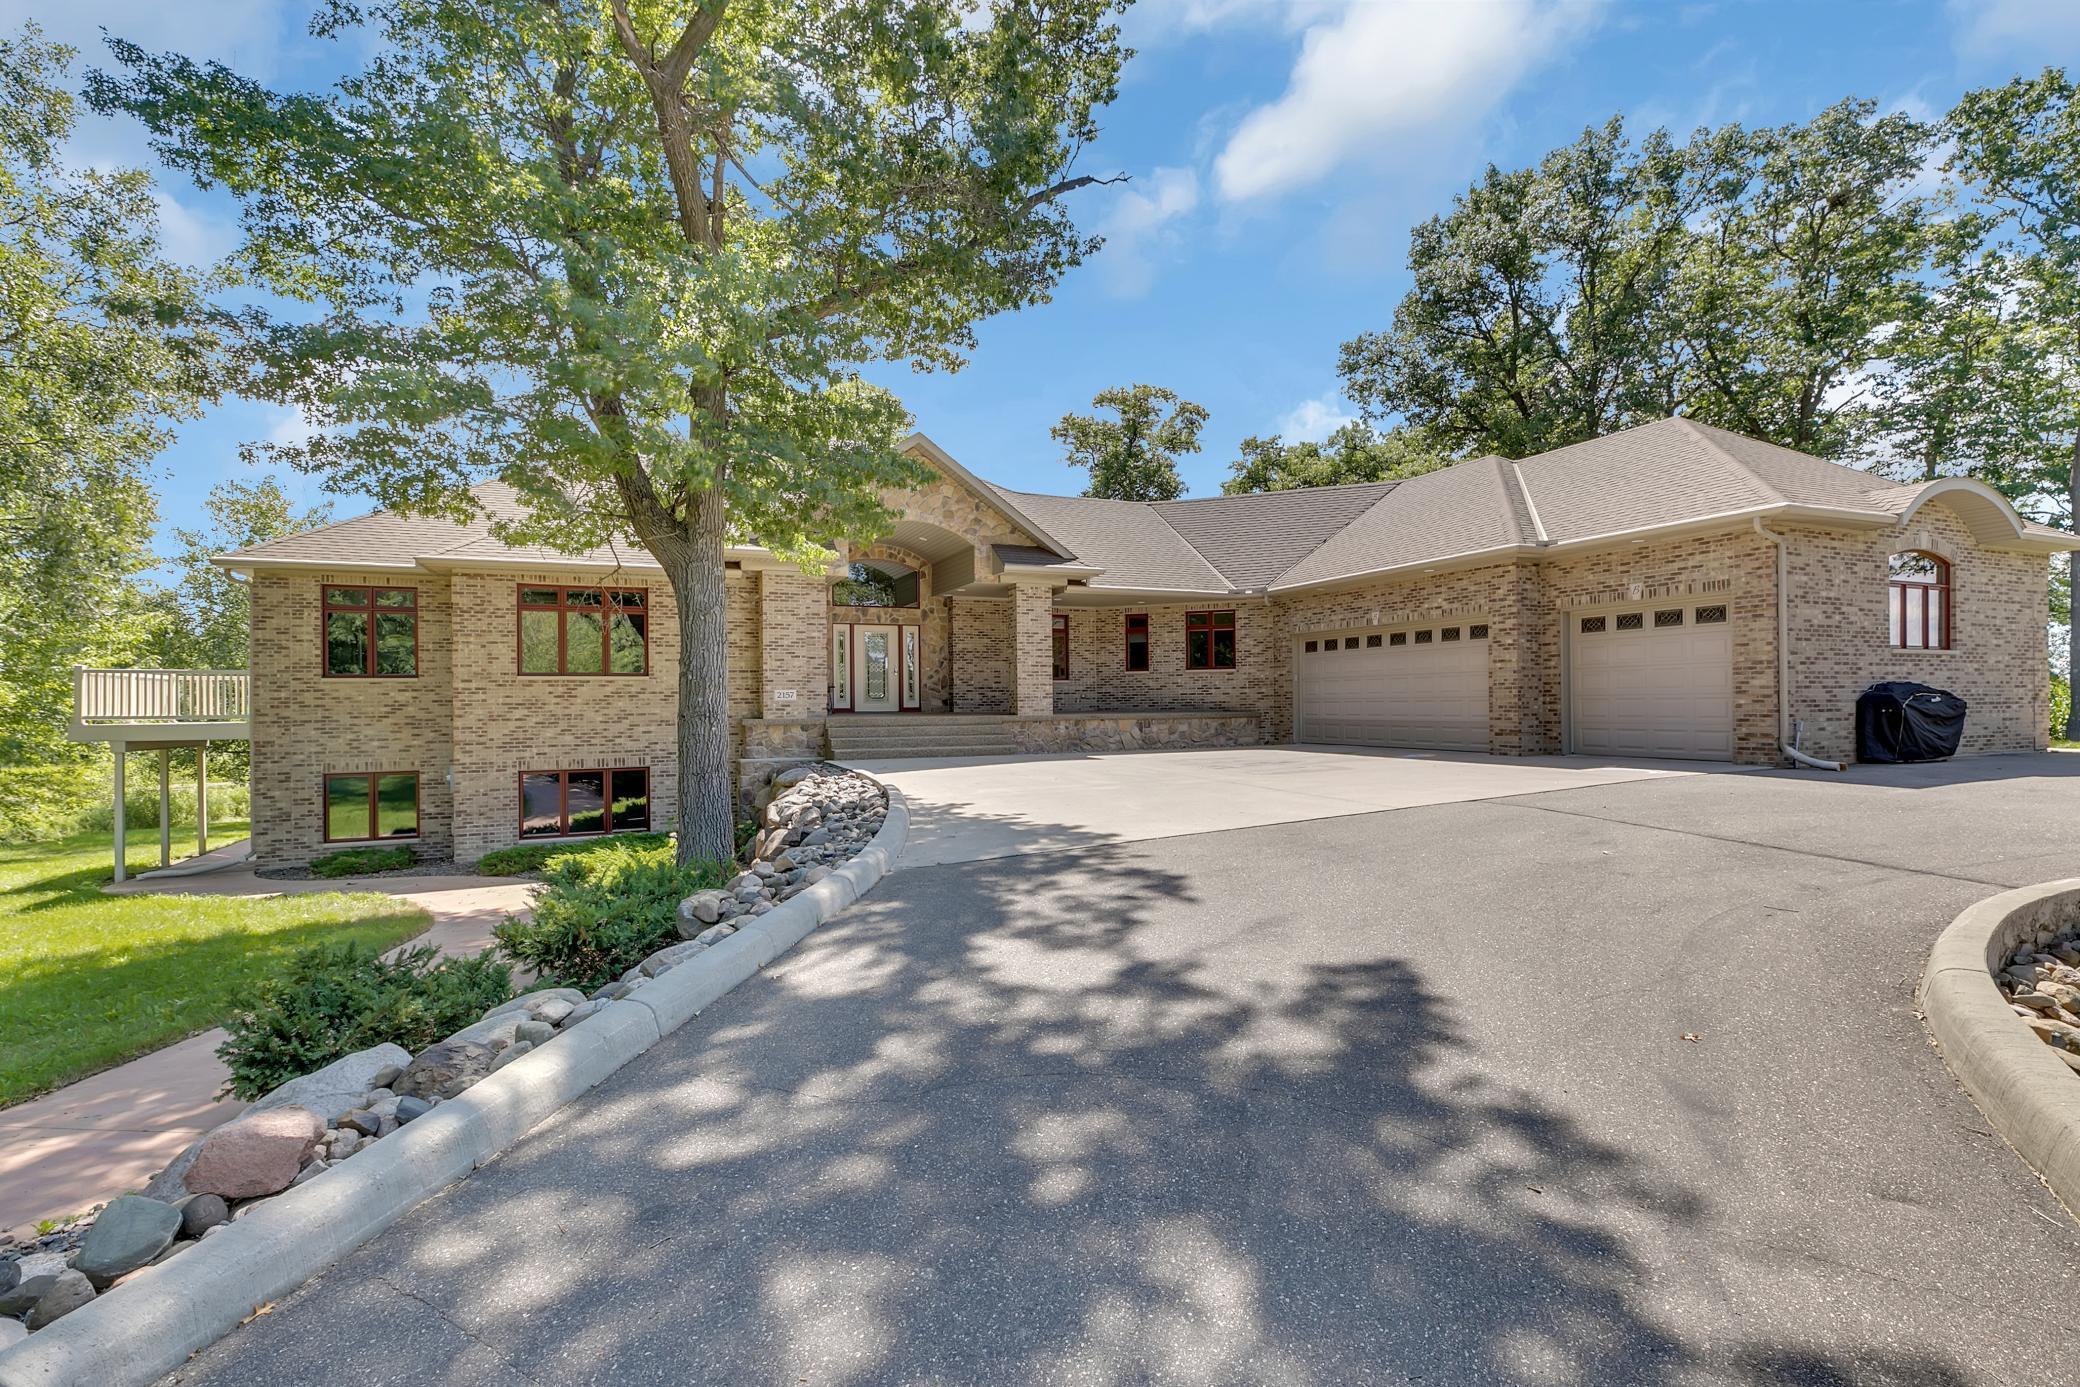 2157 75th Avenue NE Property Photo - Sauk Rapids, MN real estate listing